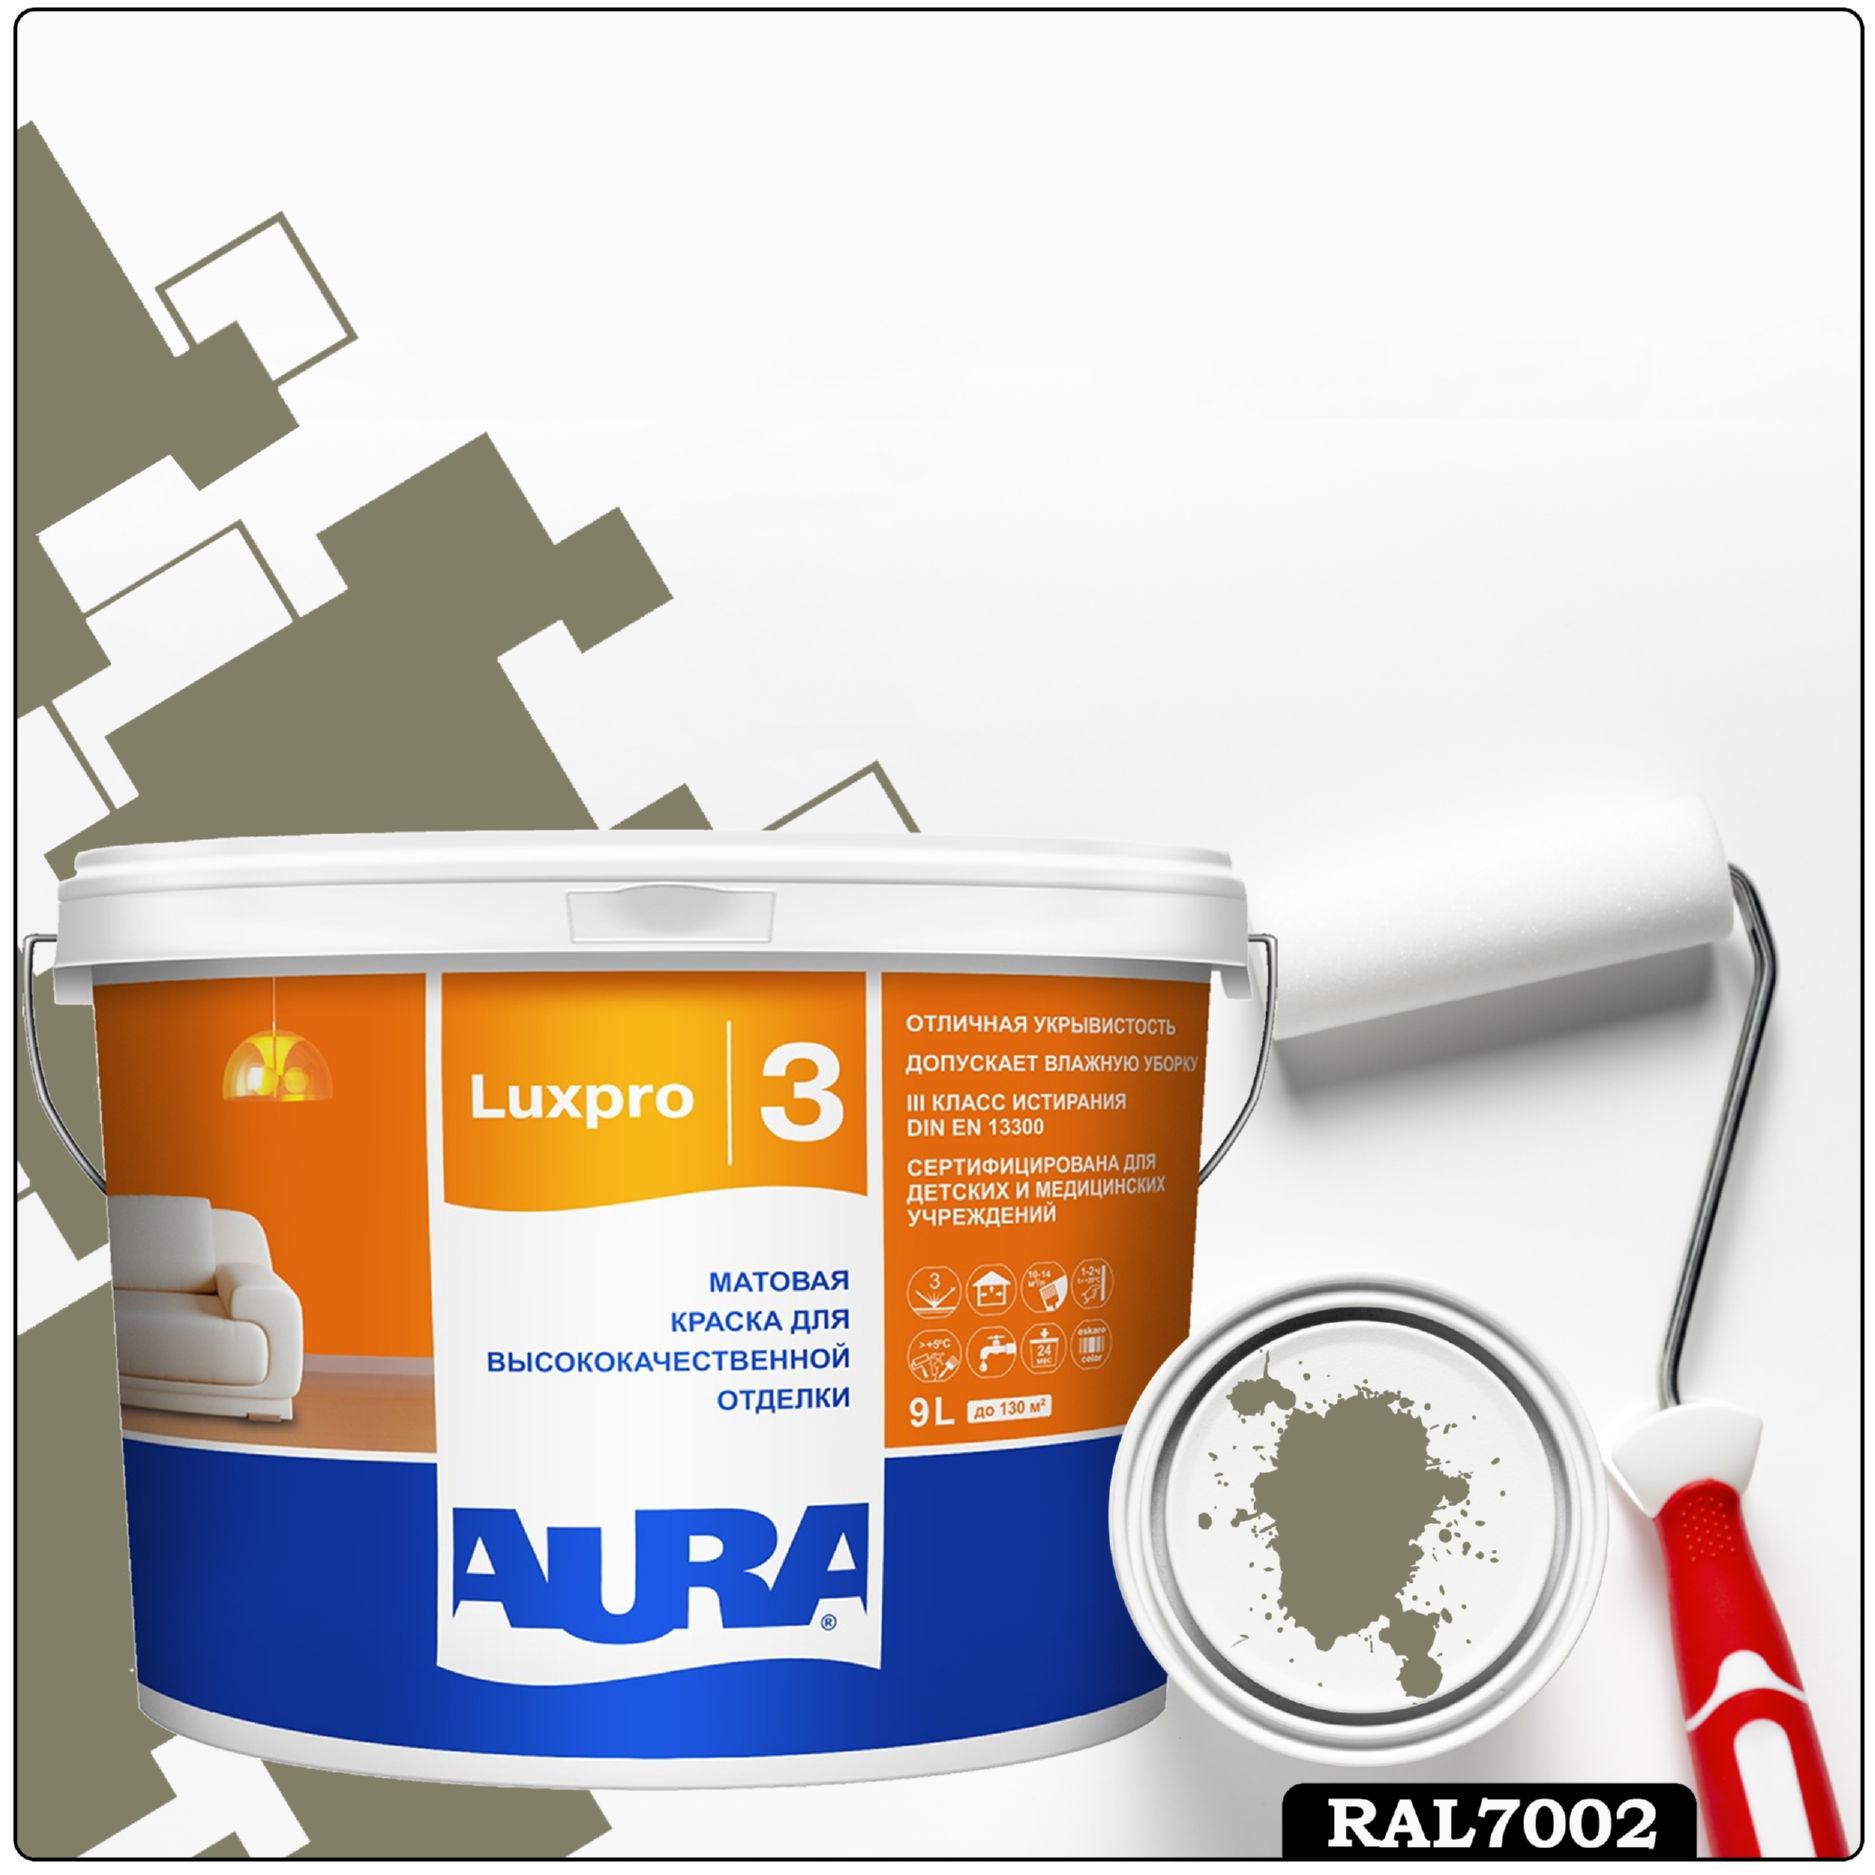 Фото 3 - Краска Aura LuxPRO 3, RAL 7002 Оливково-серый, латексная, шелково-матовая, интерьерная, 9л, Аура.